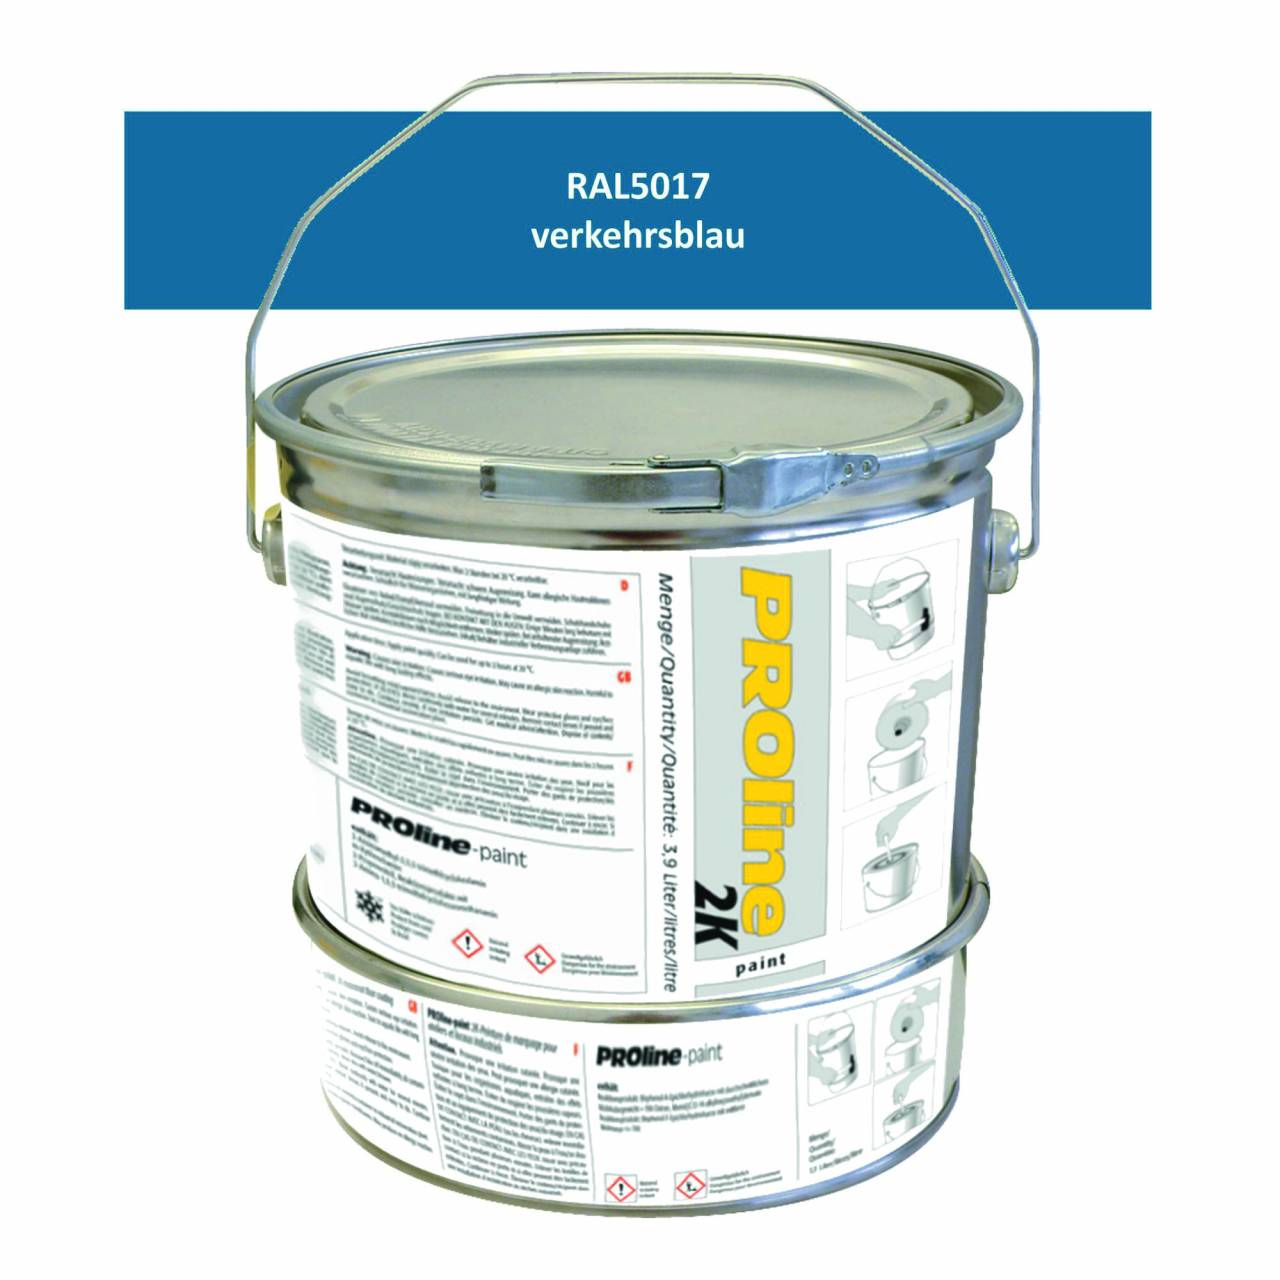 Hallen-Markierfarbe 2K 'PROline-paint' BLAU / Gebinde a 5,0 Liter